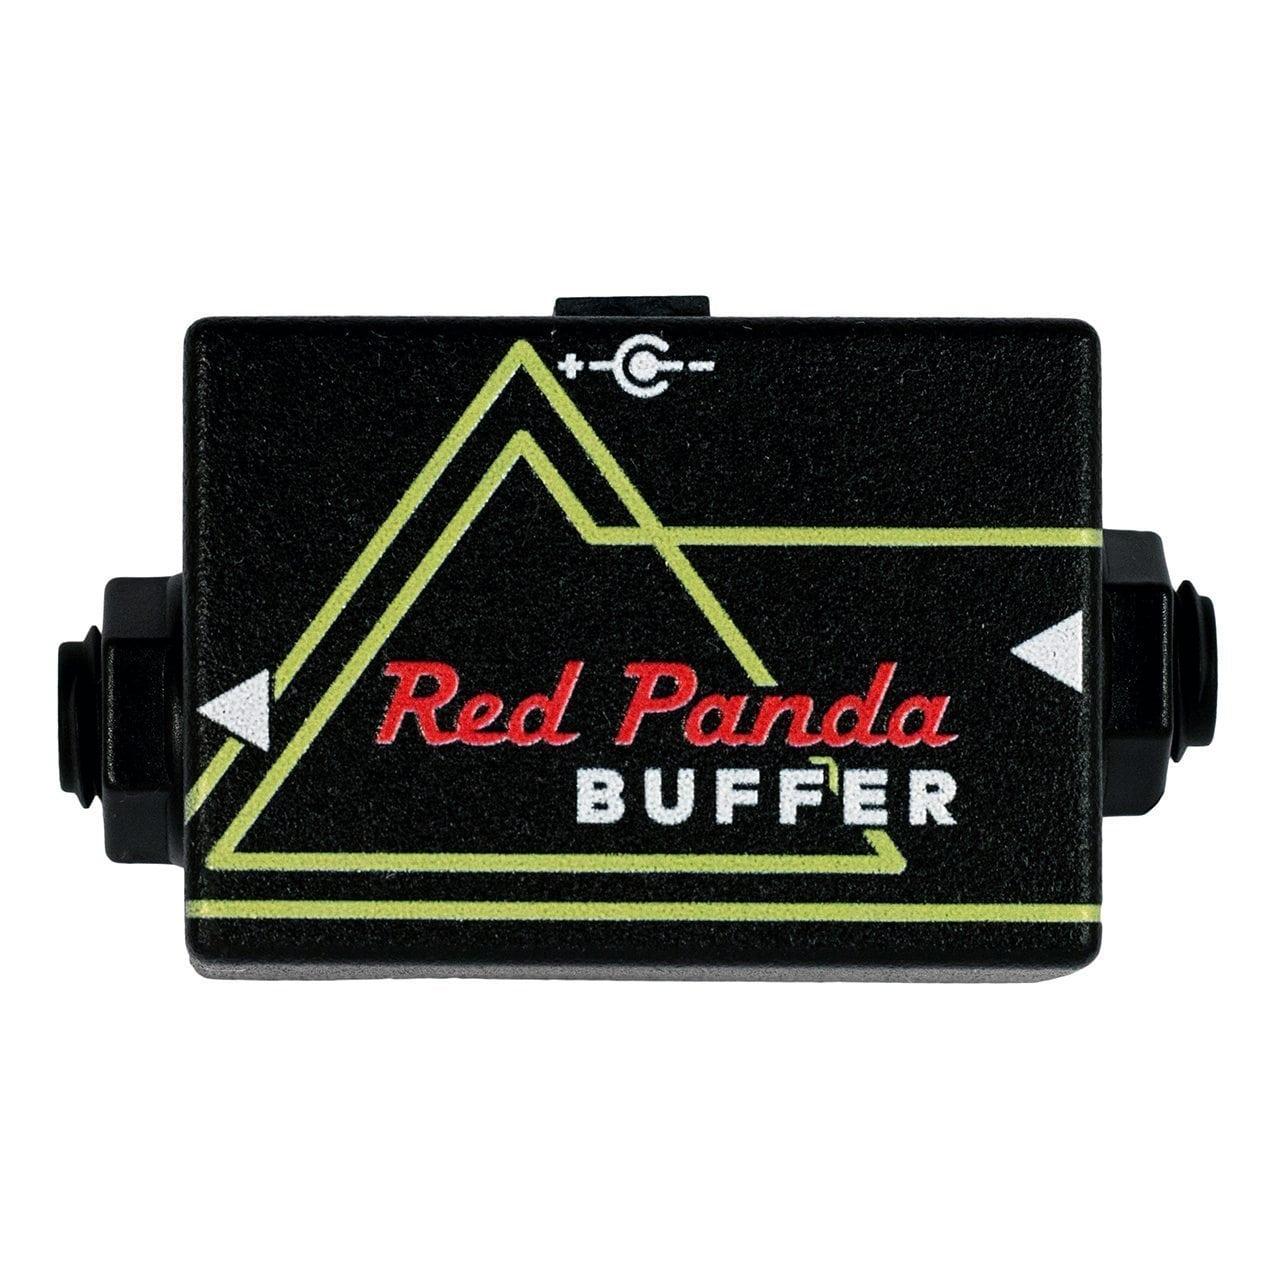 Warwick Bass Guitar Wallpaper: Redpanda-buffer